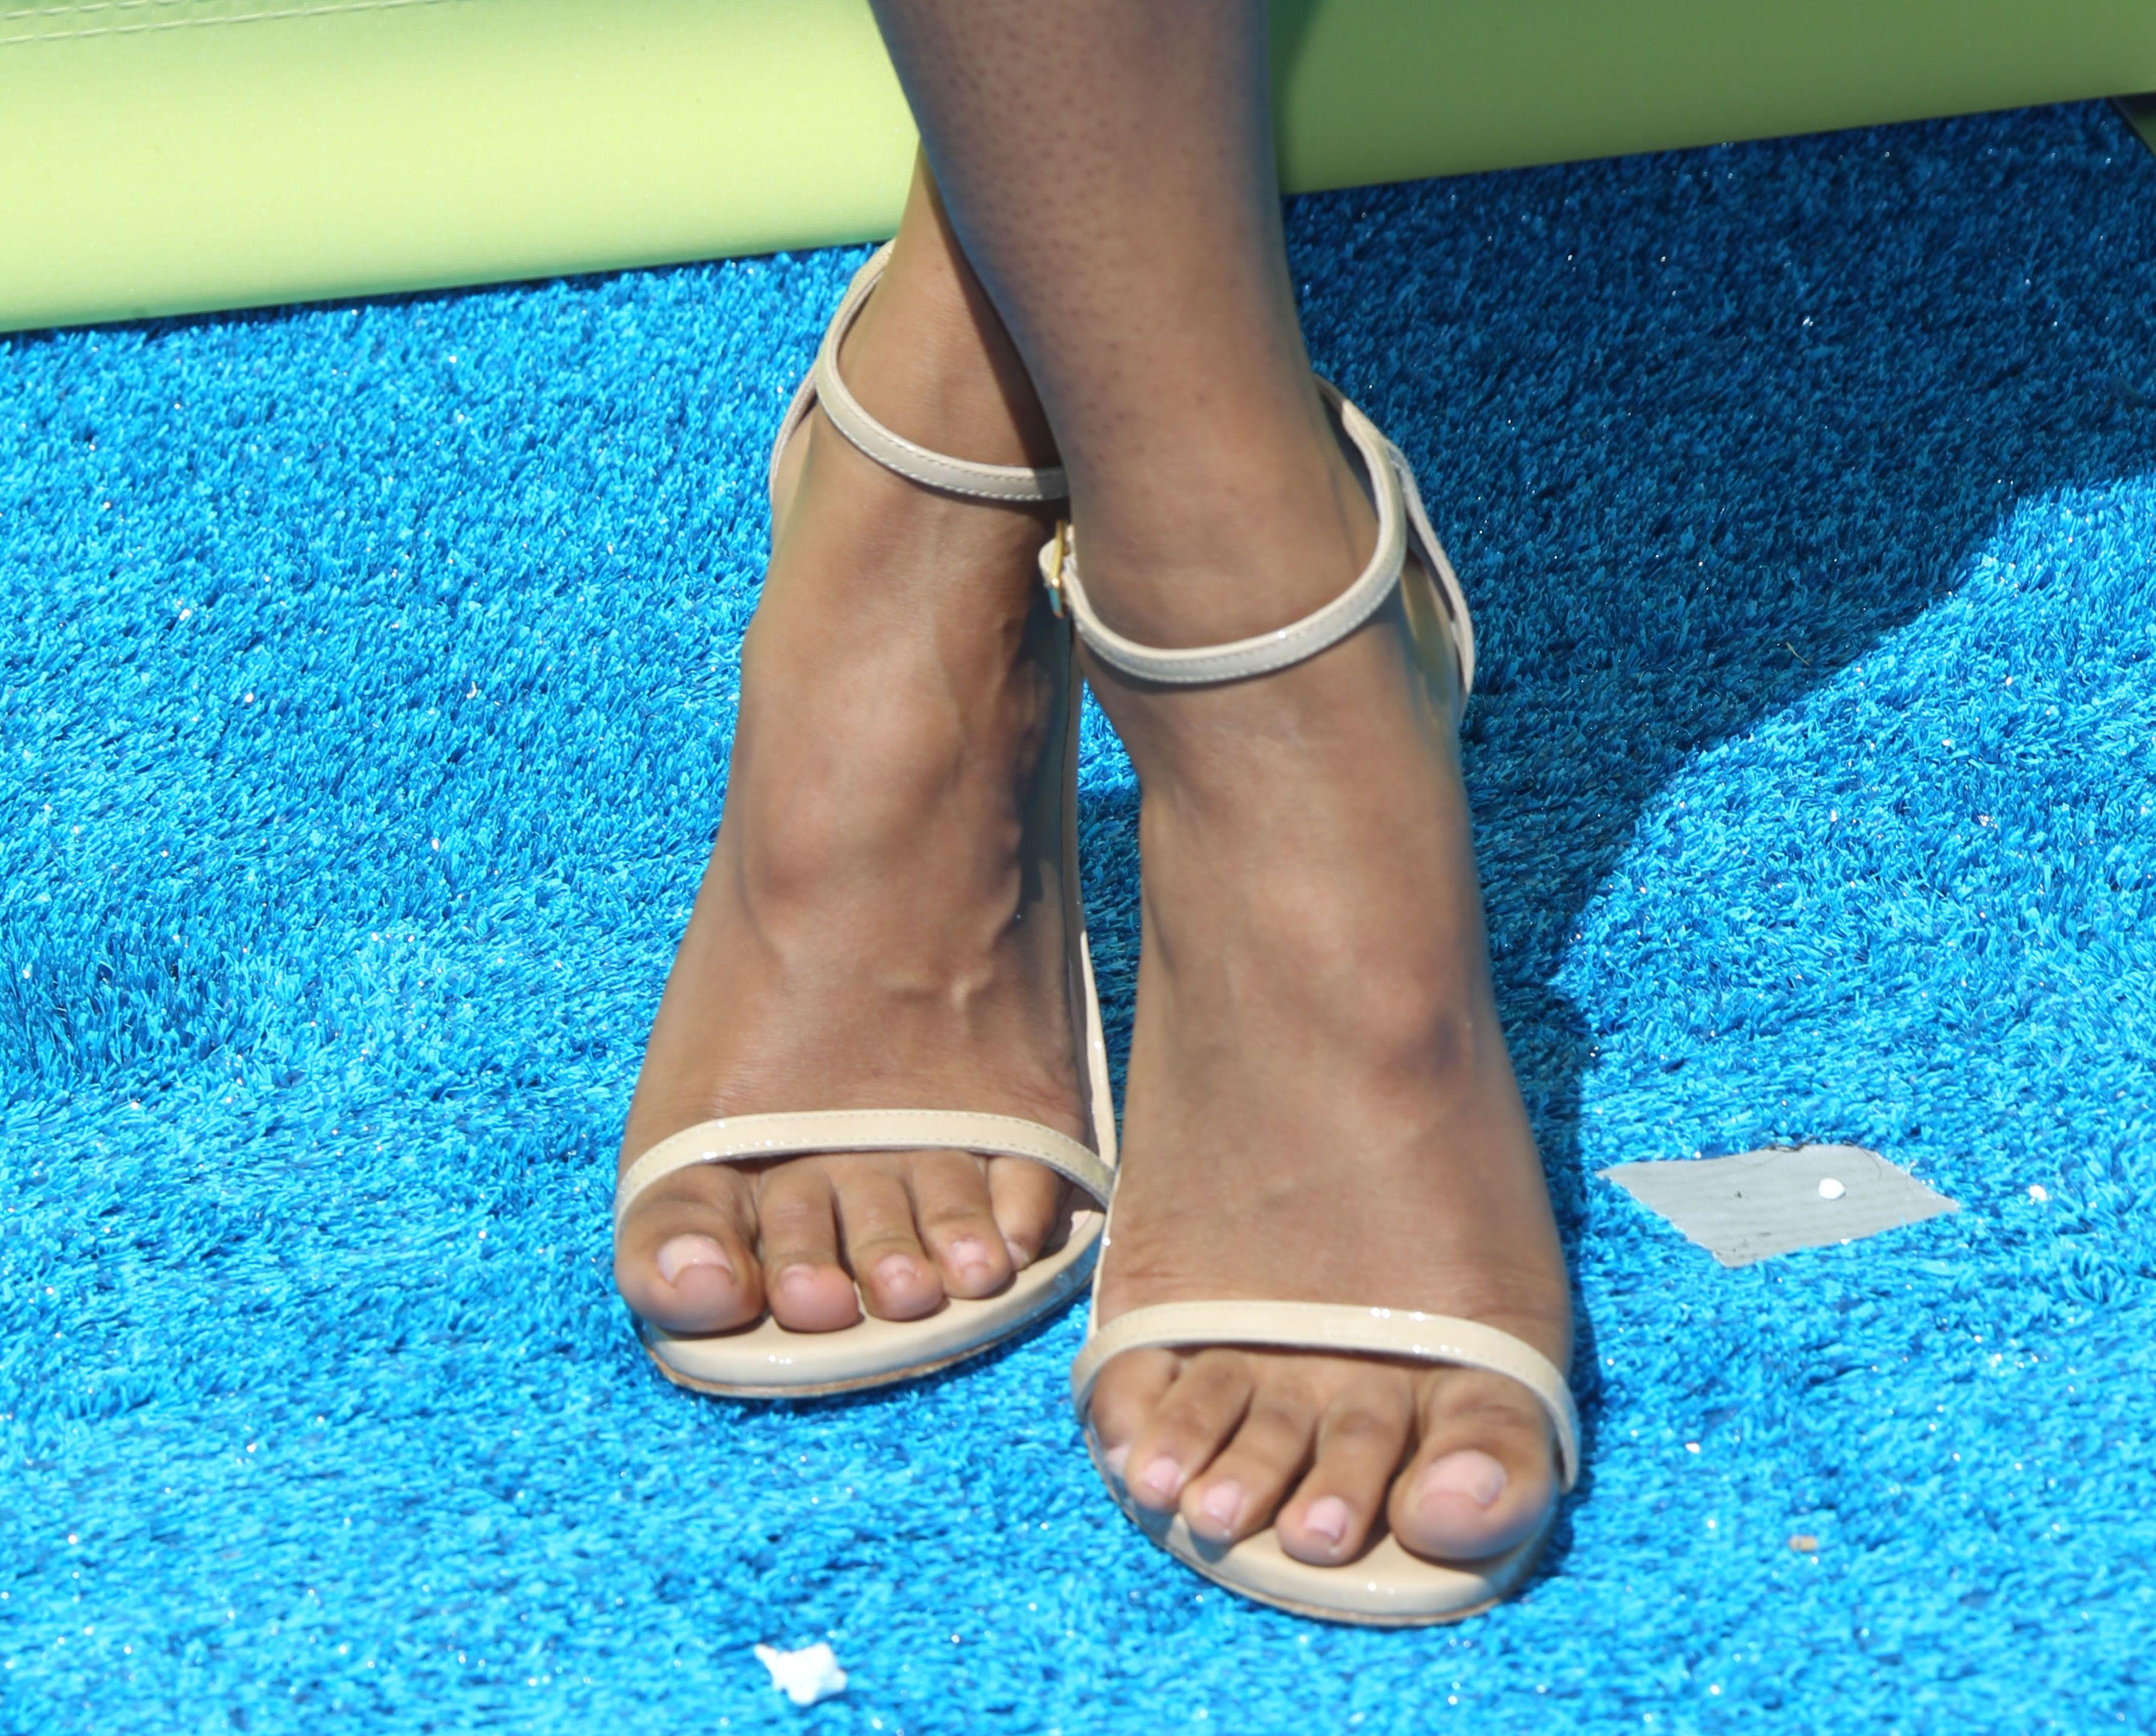 Candice Pattons Feet